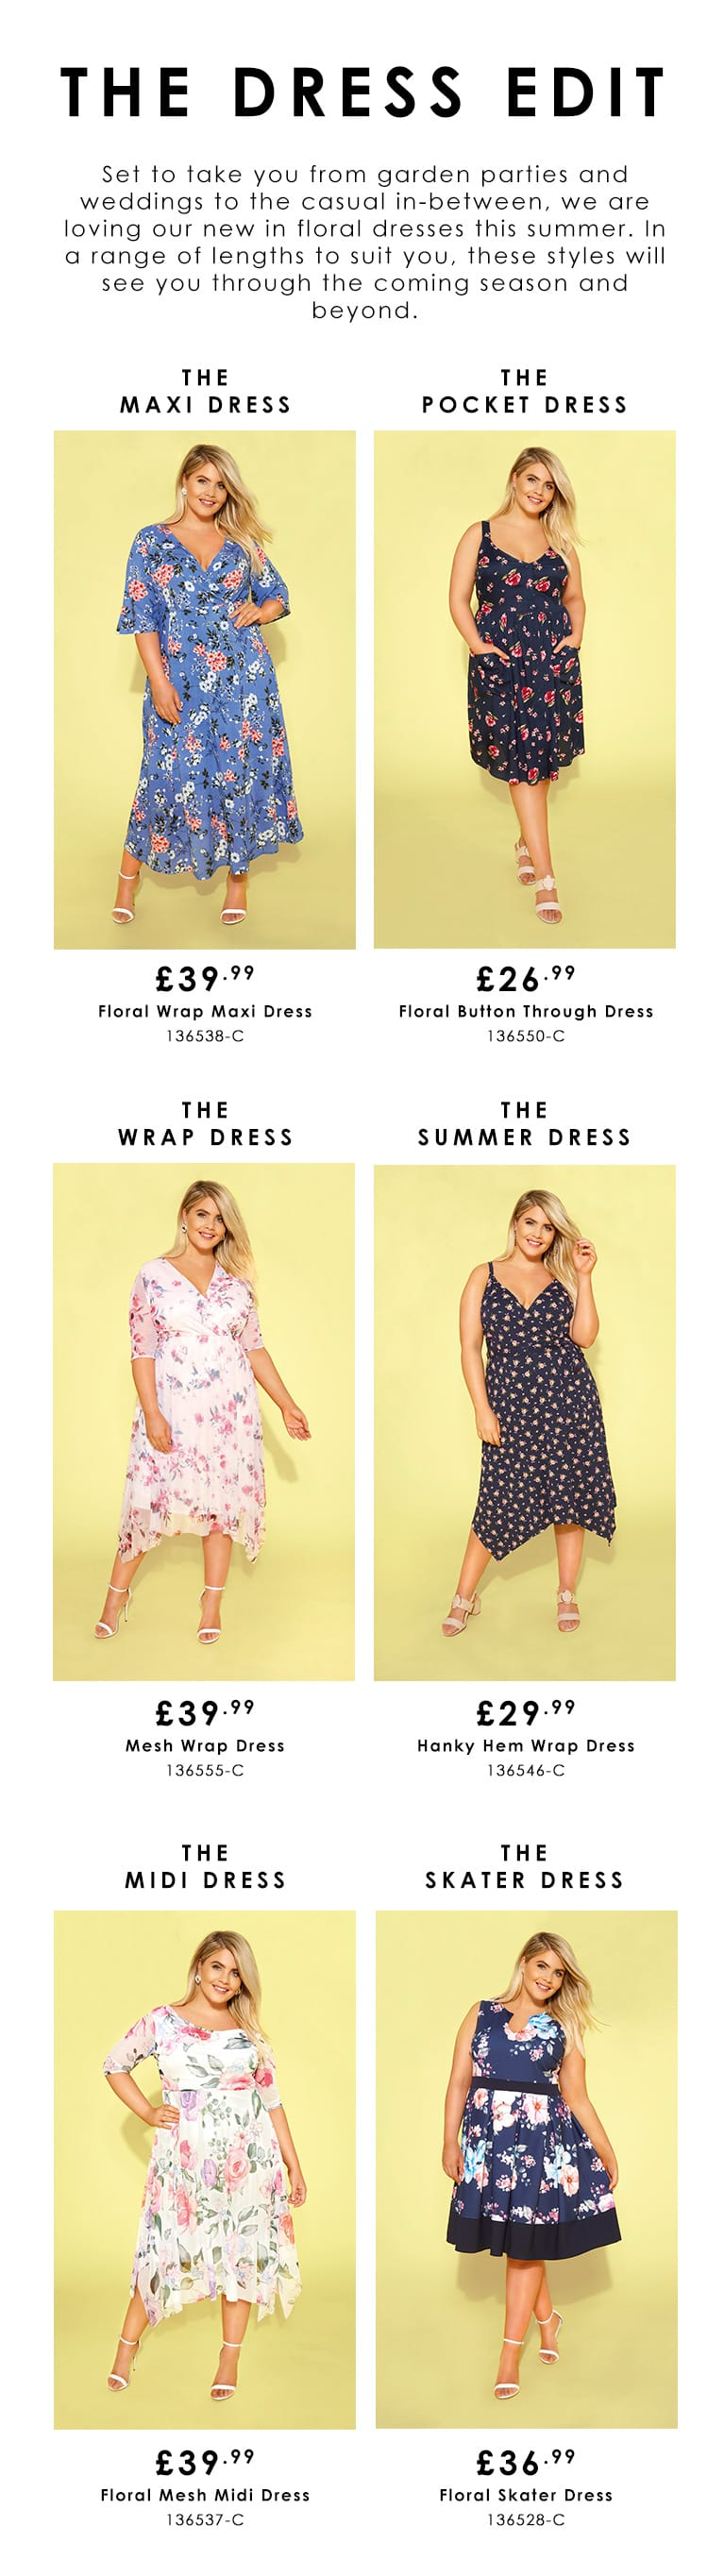 The Dress Edit